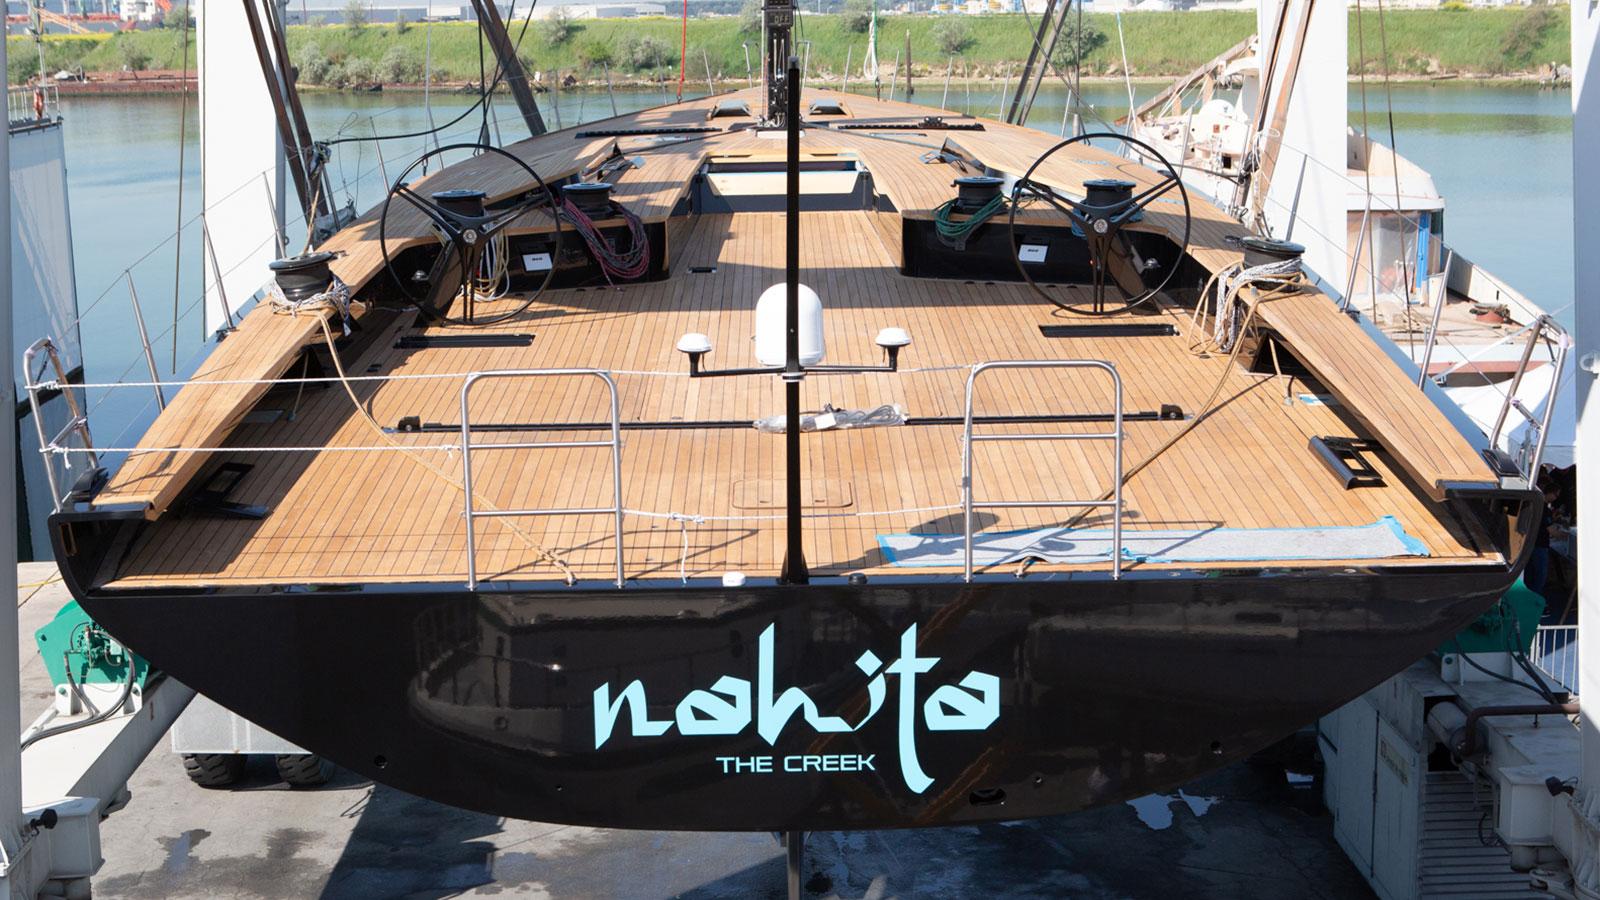 the-prow-of-the-wally-93-sailing-yacht-nahita